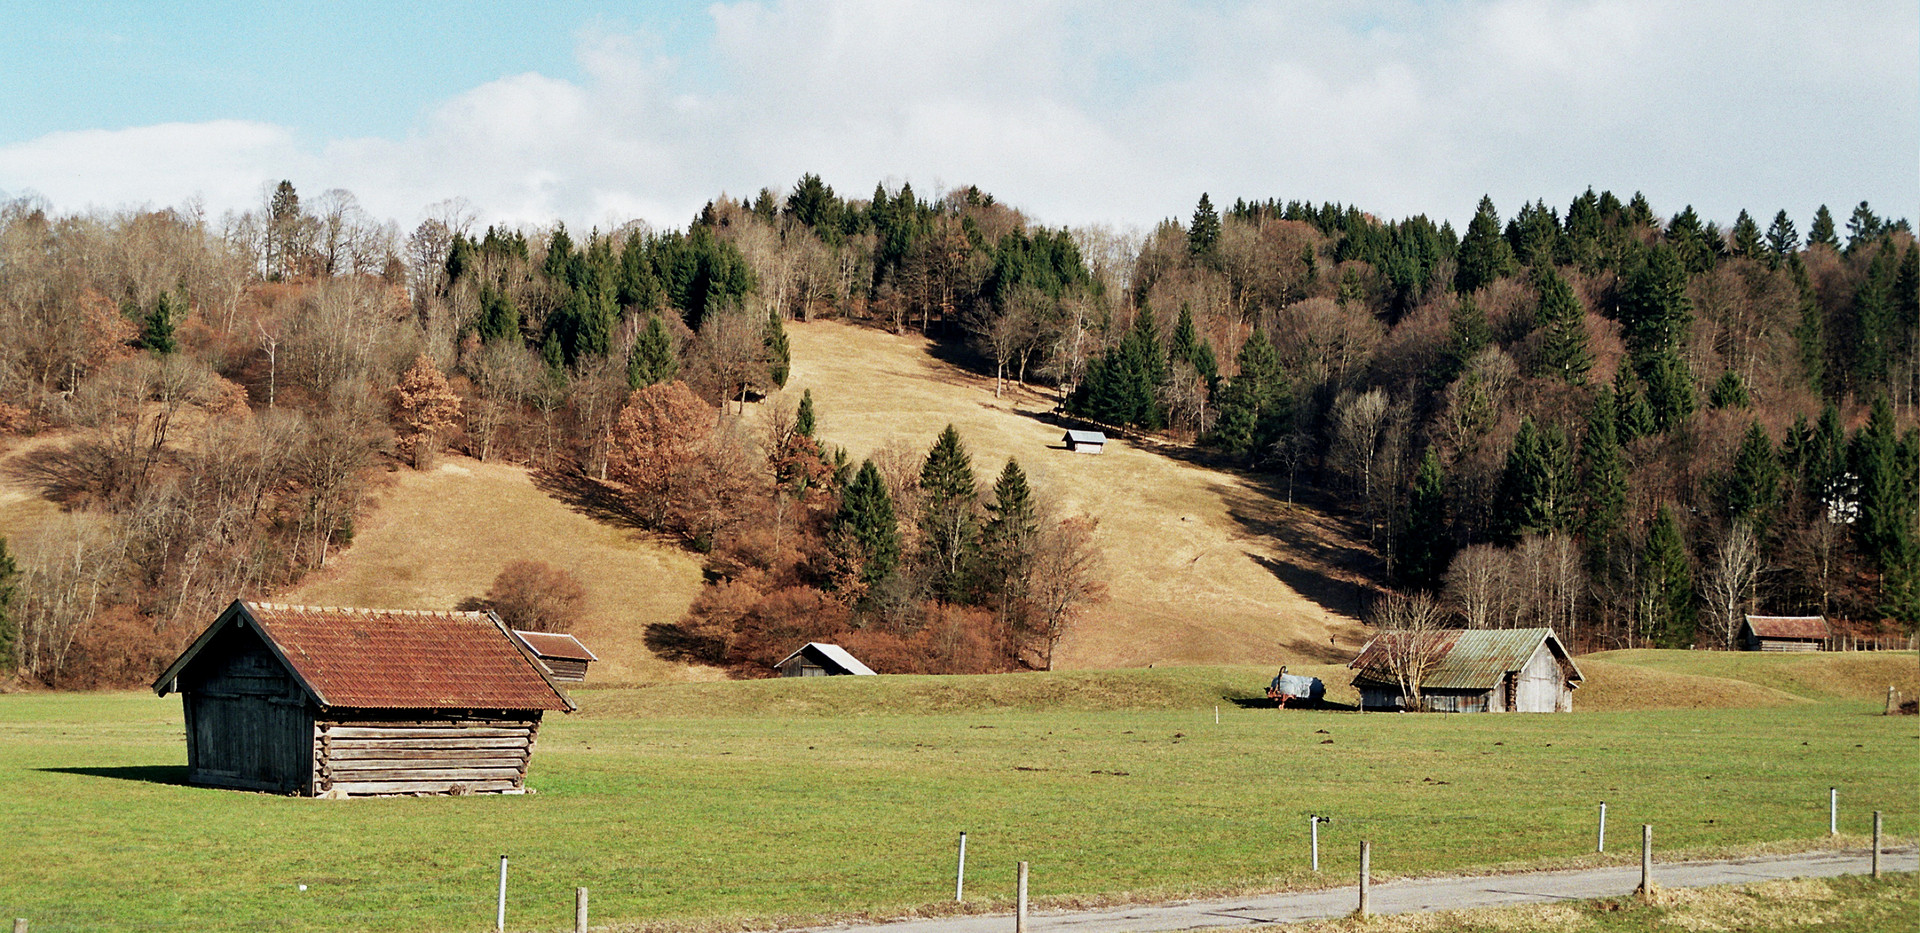 Garmisch-Partenkirchen, Germany, April 2018